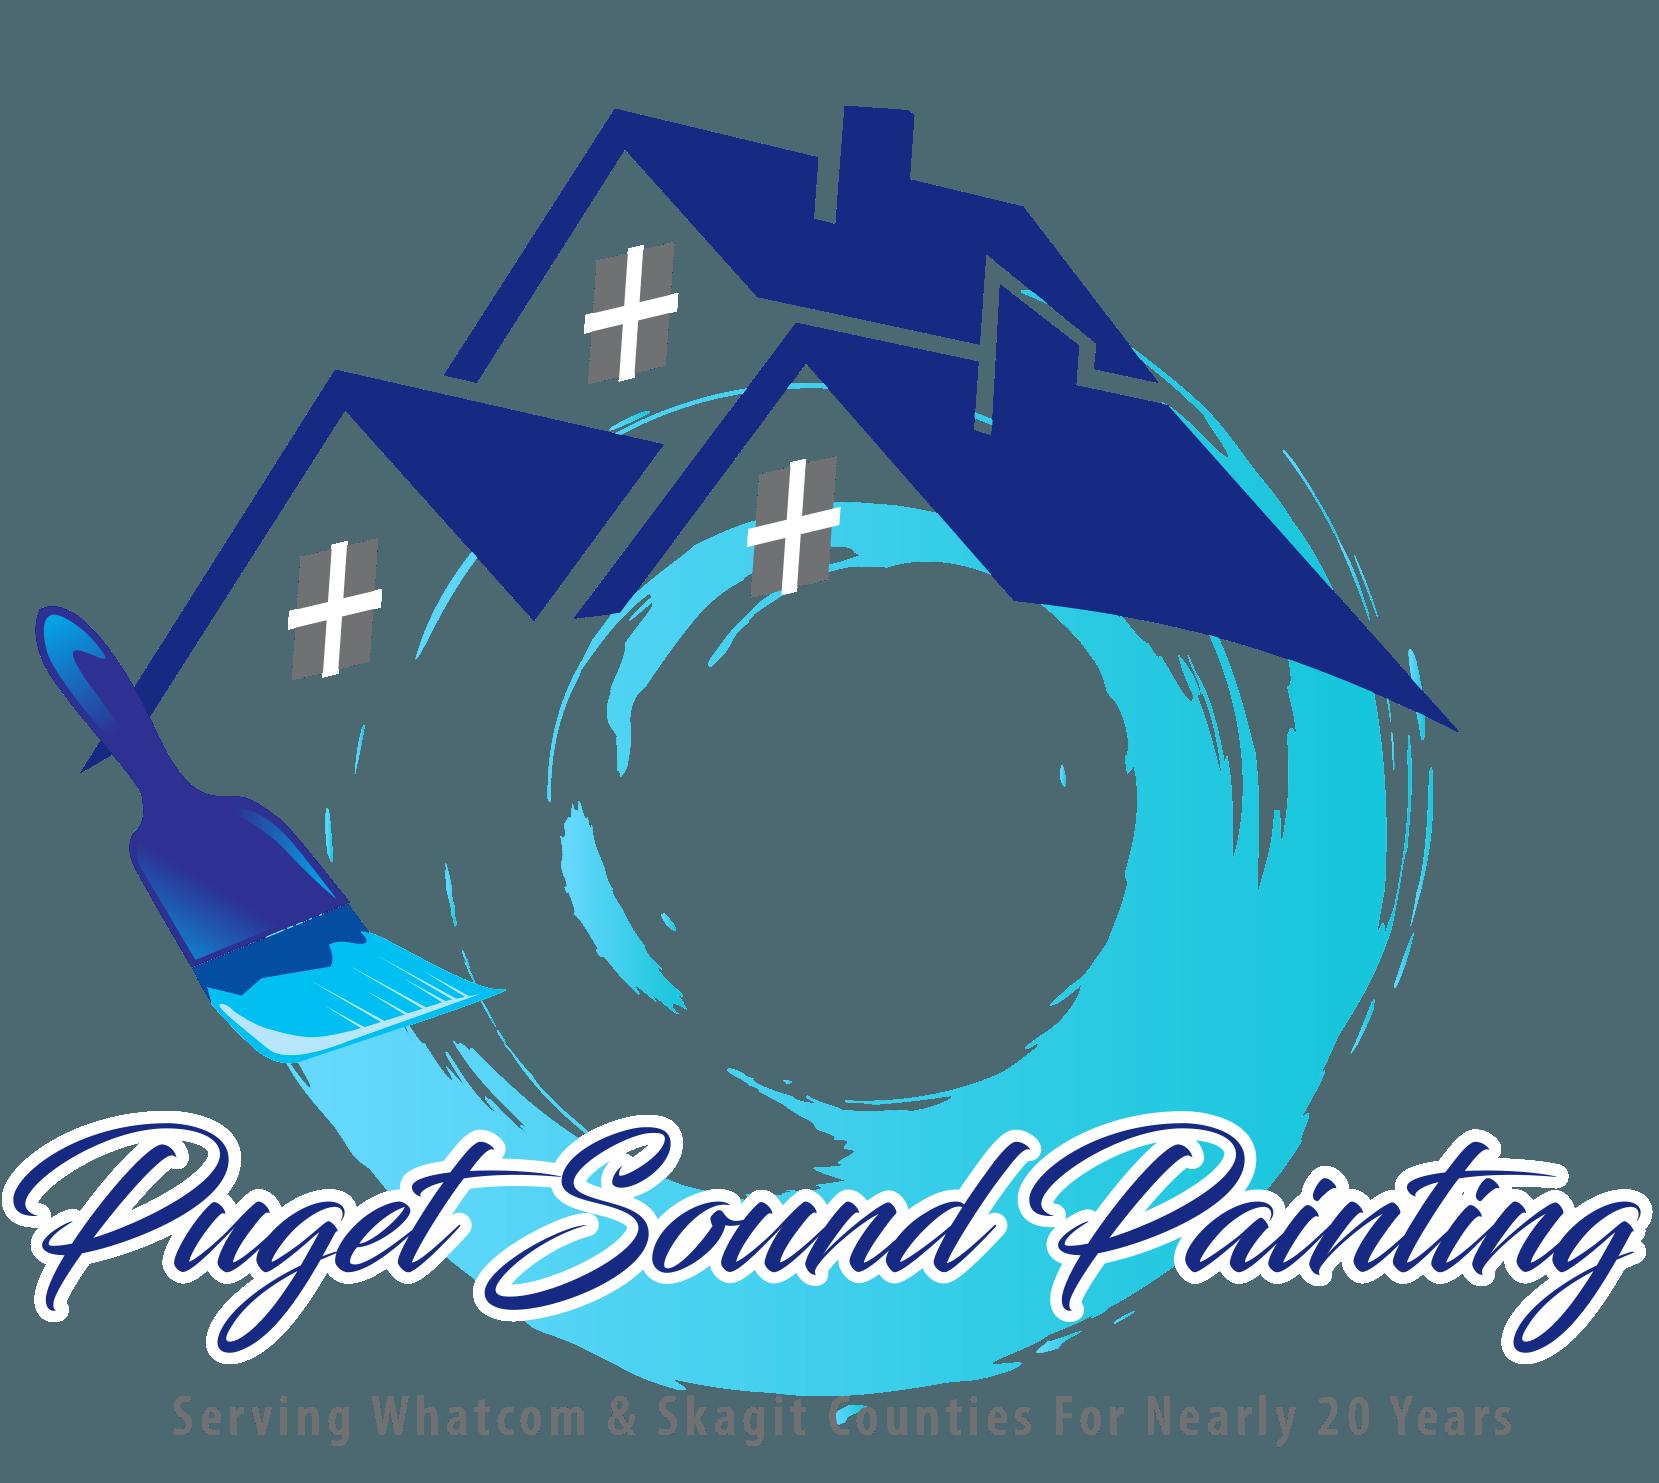 Puget Sound Painting logo